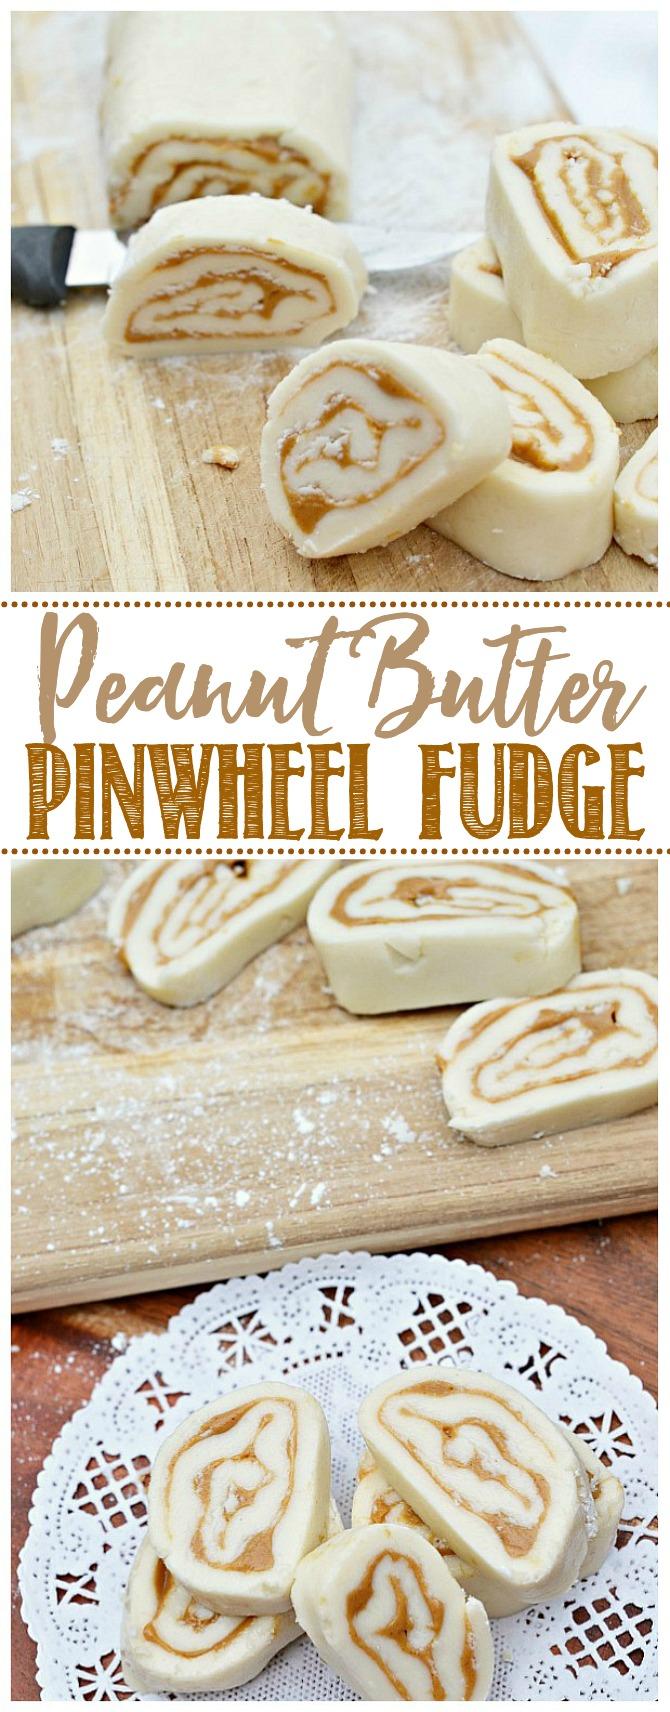 Old fashioned peanut butter pinwheel fudge.